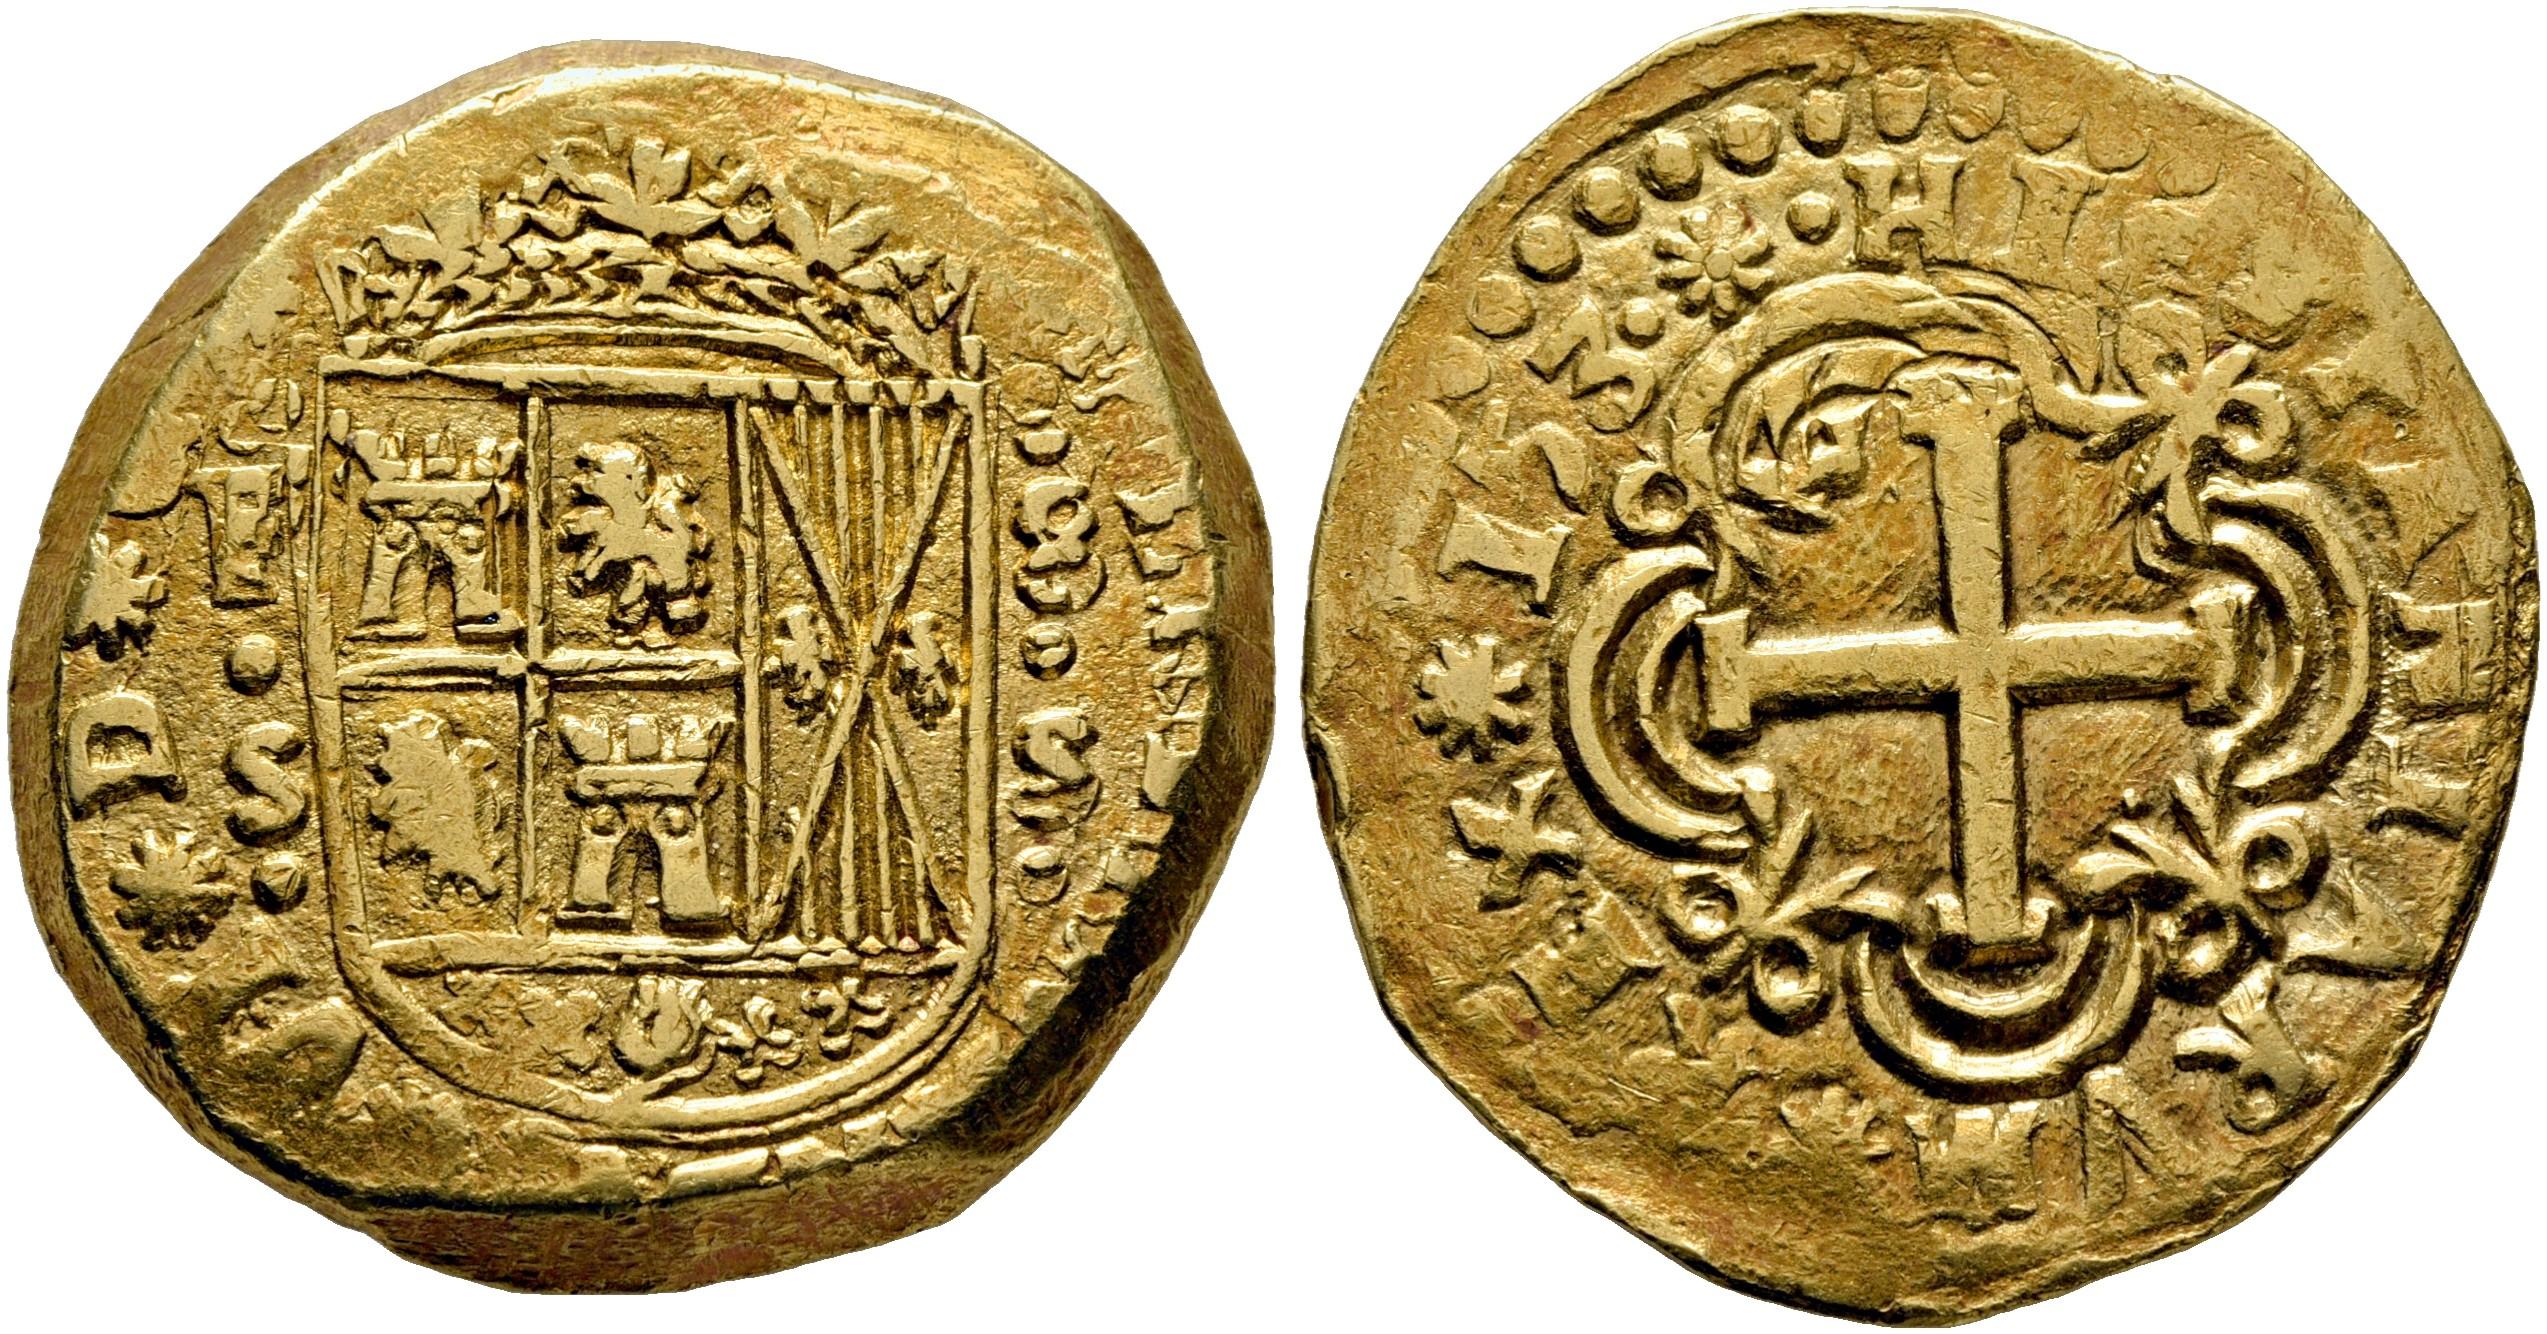 8-escudos-de-nuevo-reino.-1753.-fernando-vi.-salida-10.000-euros.-cayon-subastas